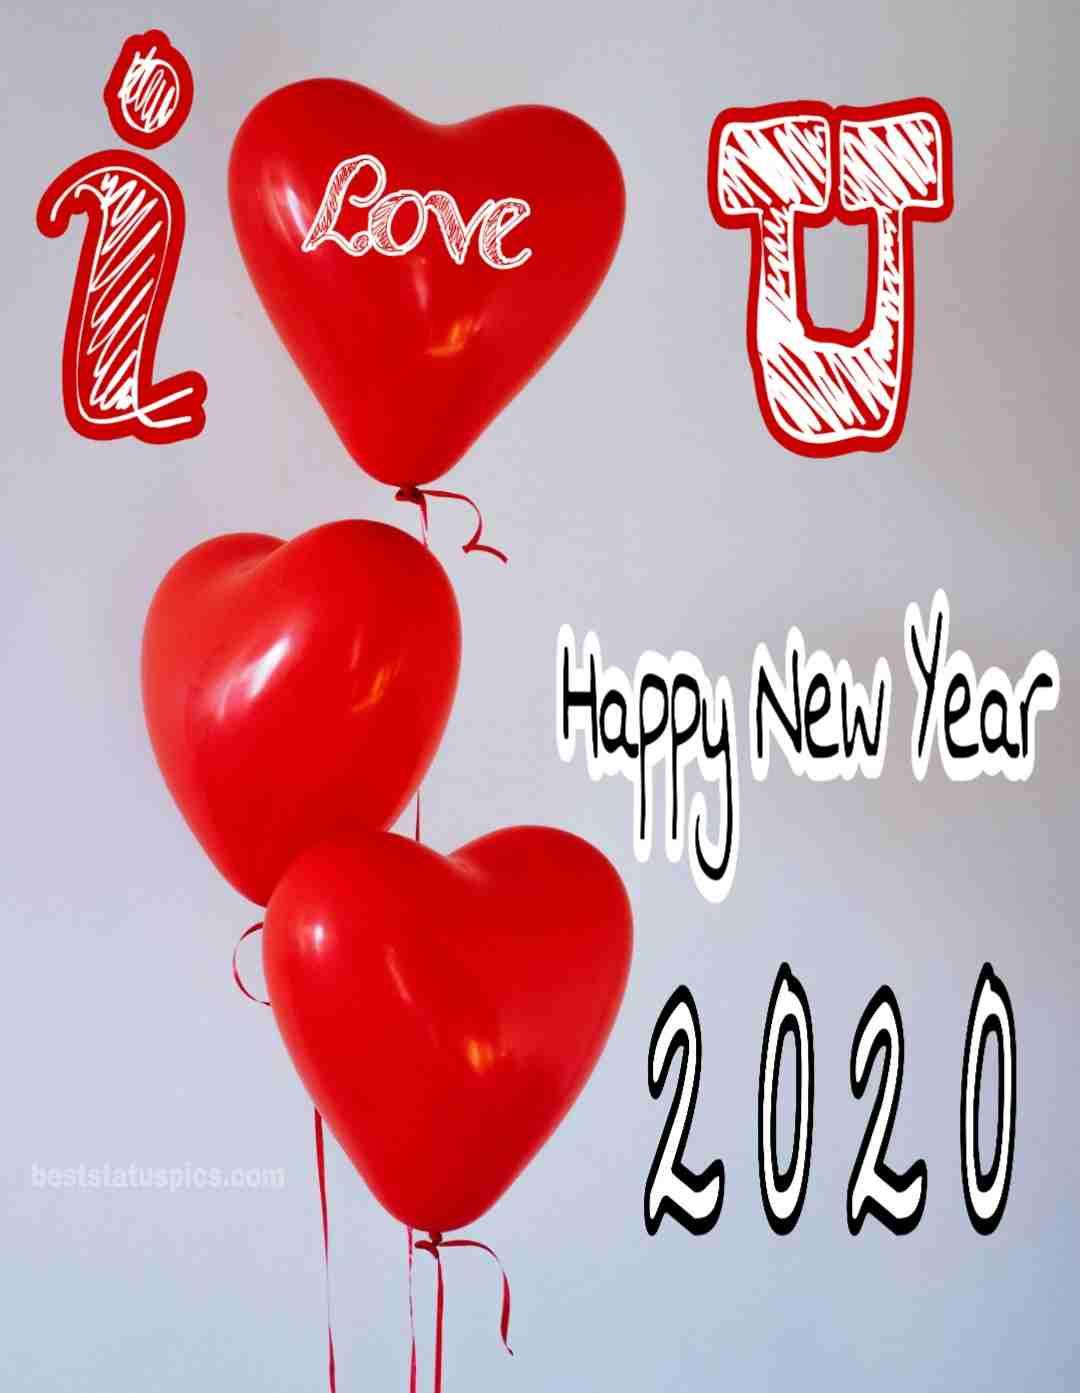 Happy New Year 2020 Facebook Covers Whatsapp Dp Status Best